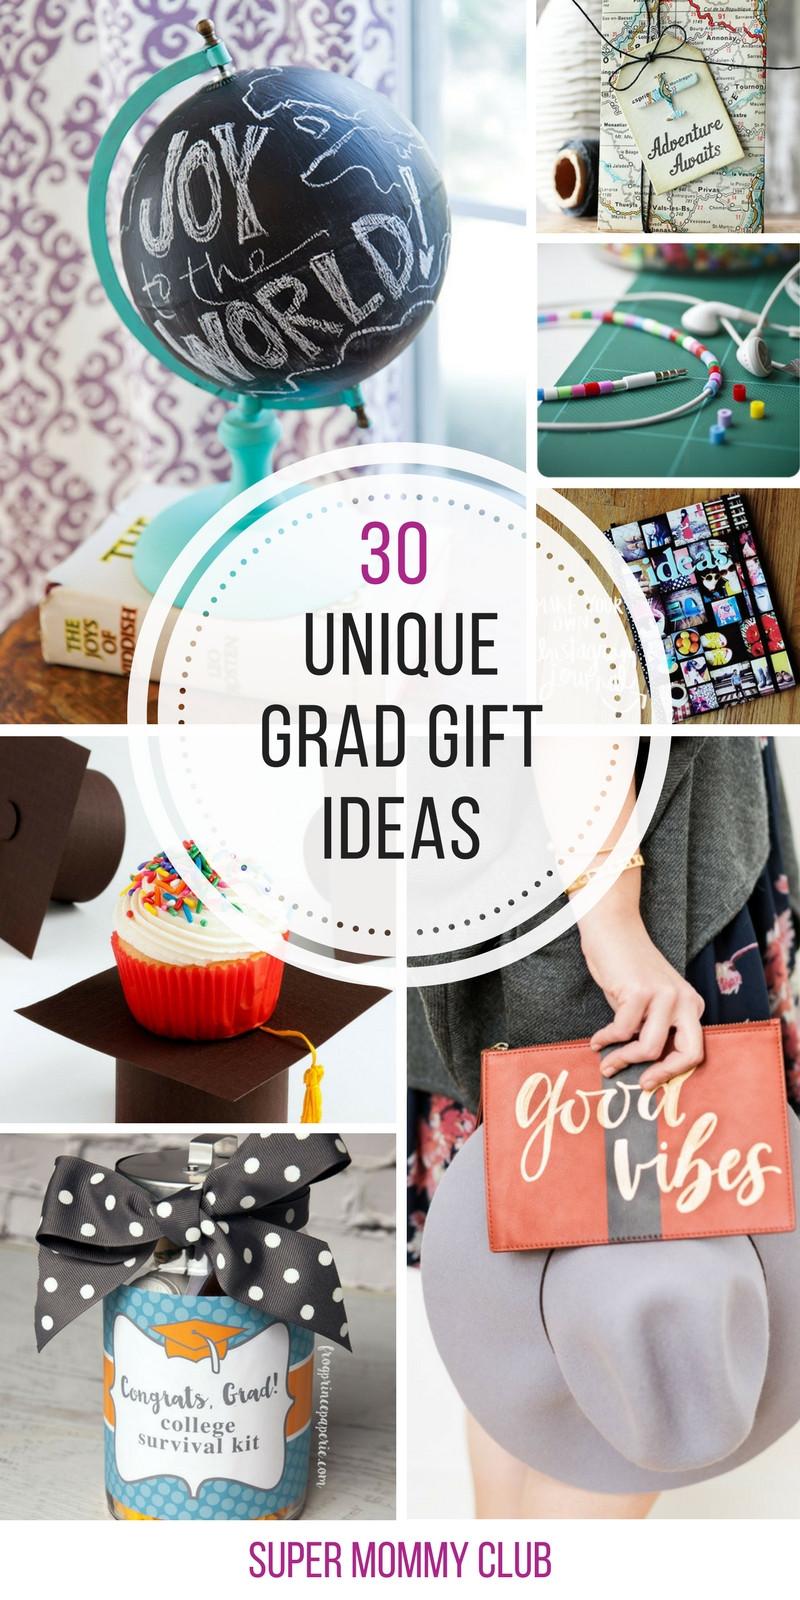 Best ideas about Unique Graduation Gift Ideas . Save or Pin 30 Unique College Graduation Gift Ideas They ll Actually Now.